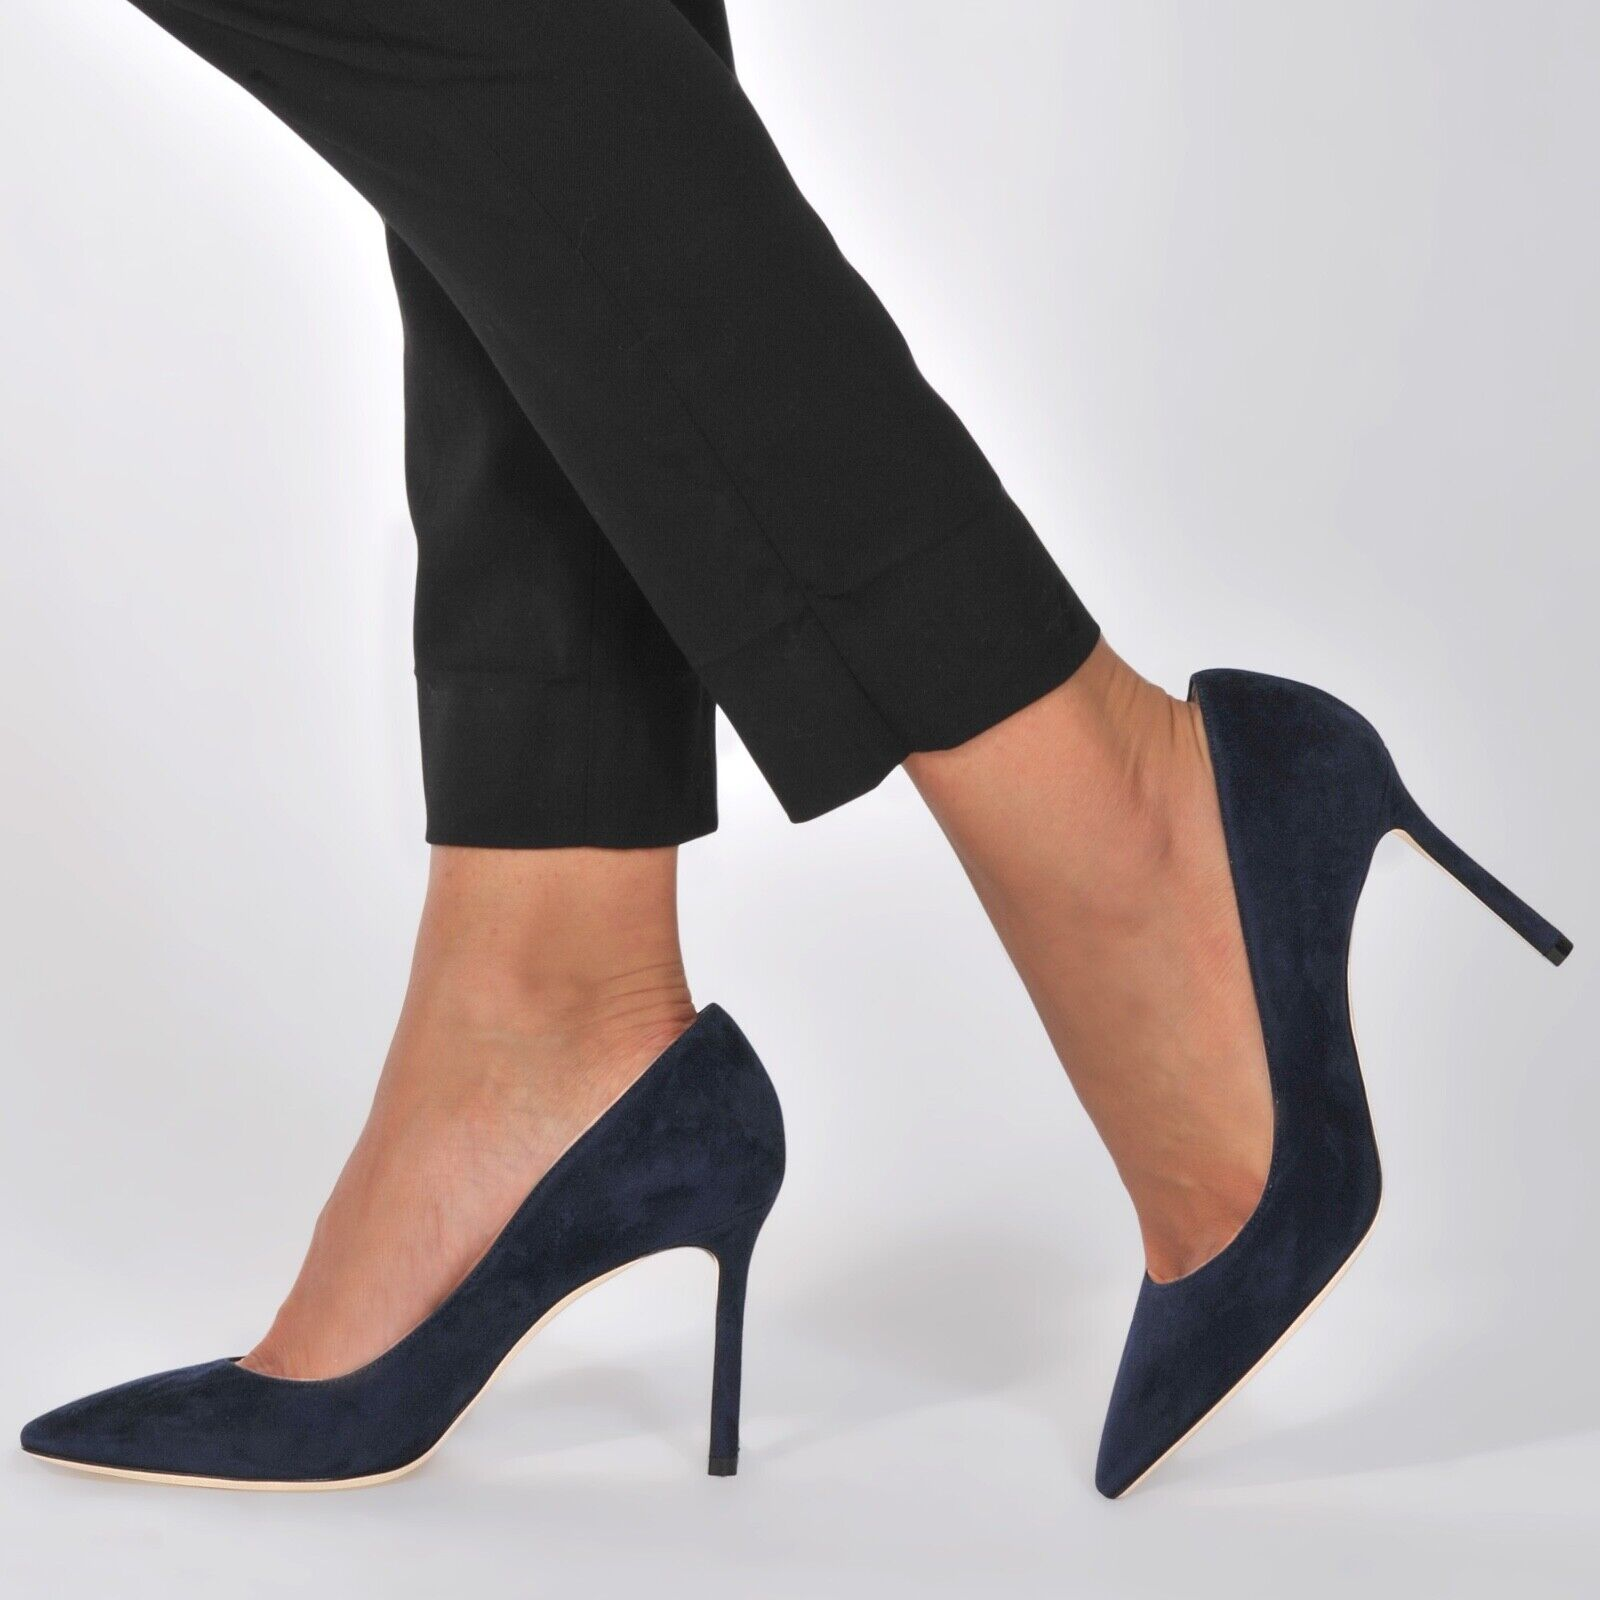 Jimmy Choo Romy Escarpins 85 mm Daim Bleu Talon Chaussures Taille 36 (US 6) 595